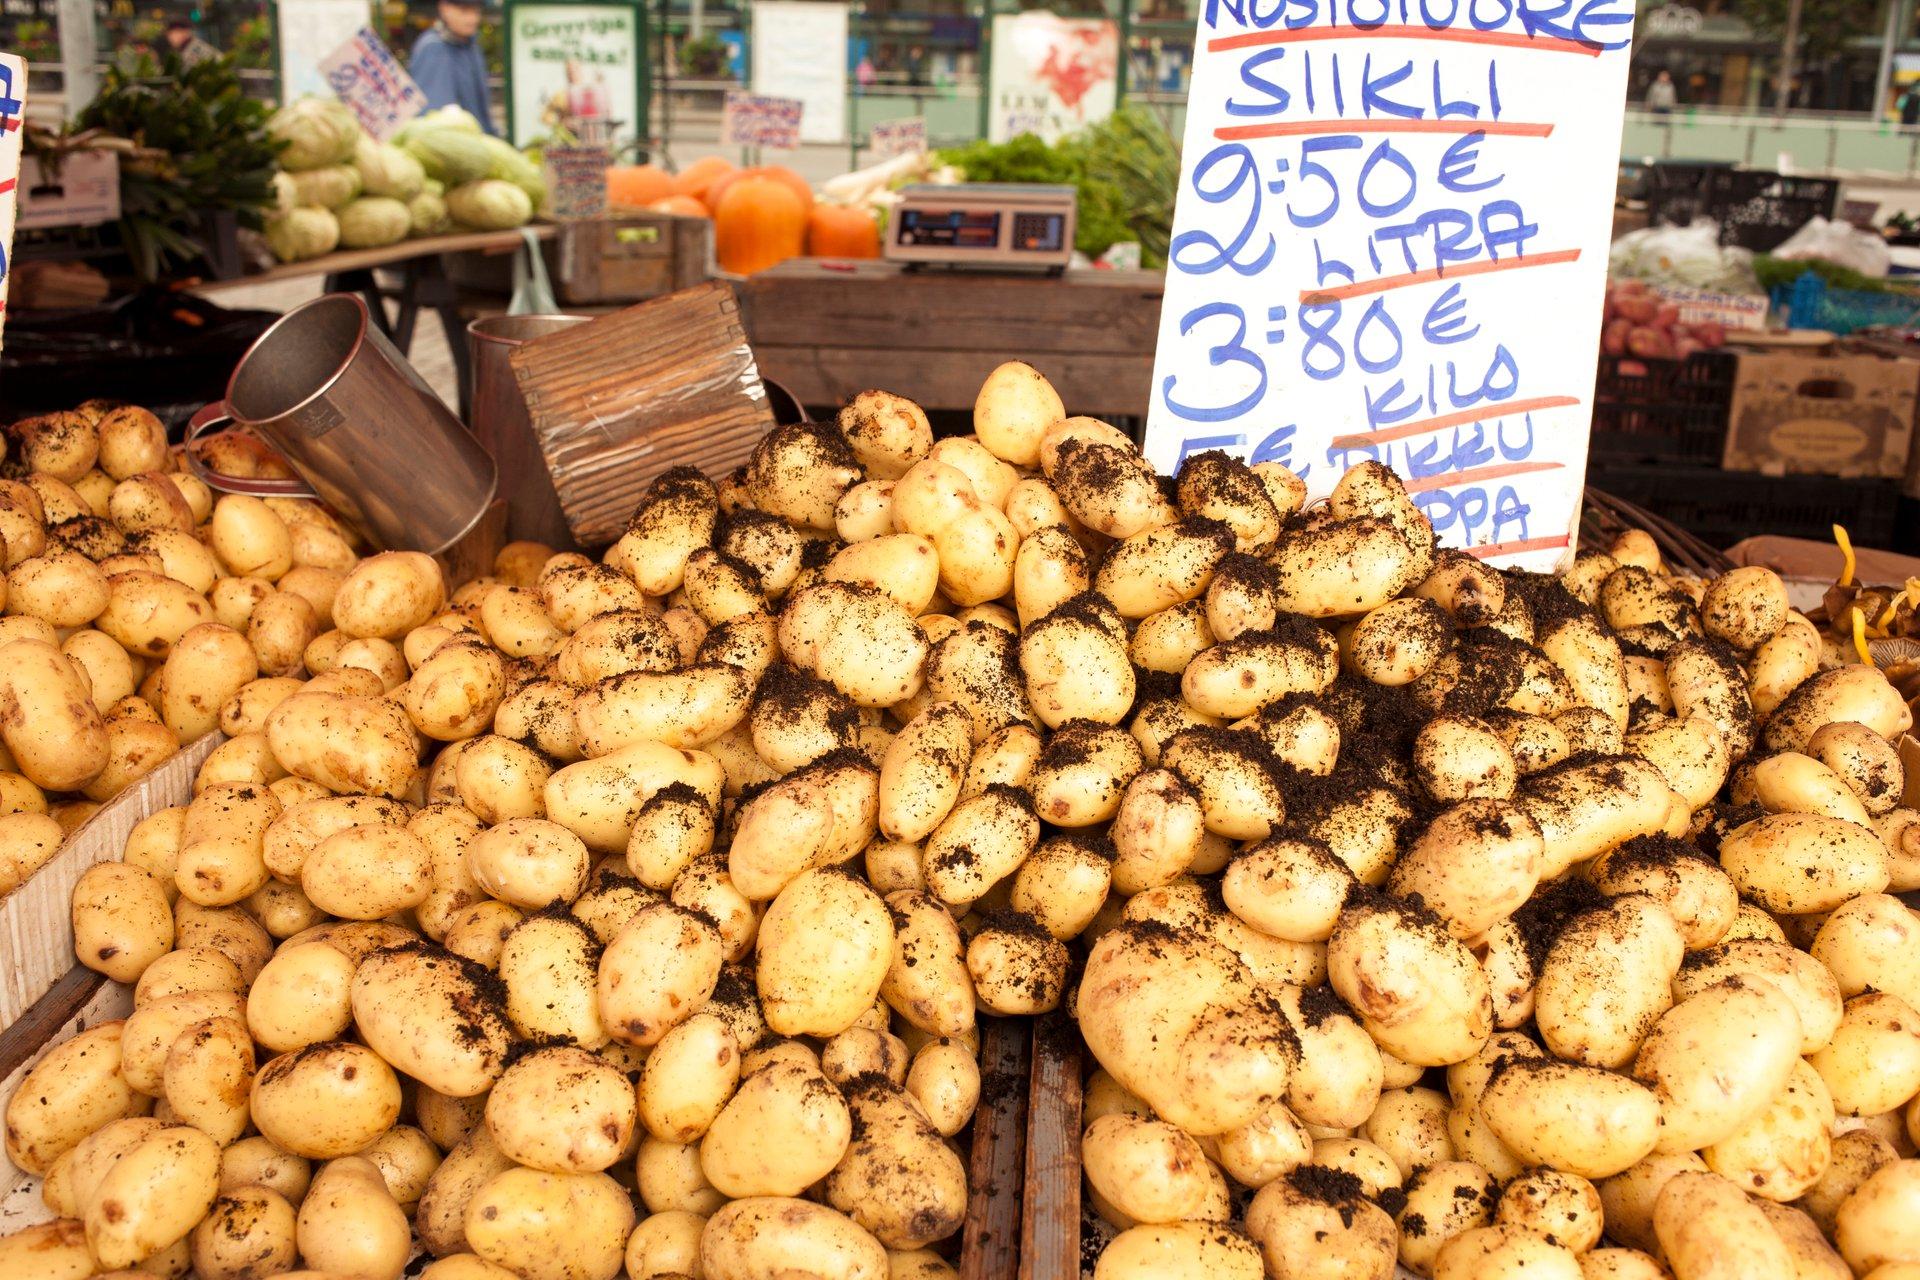 New Potato Obsession in Finland - Best Season 2019